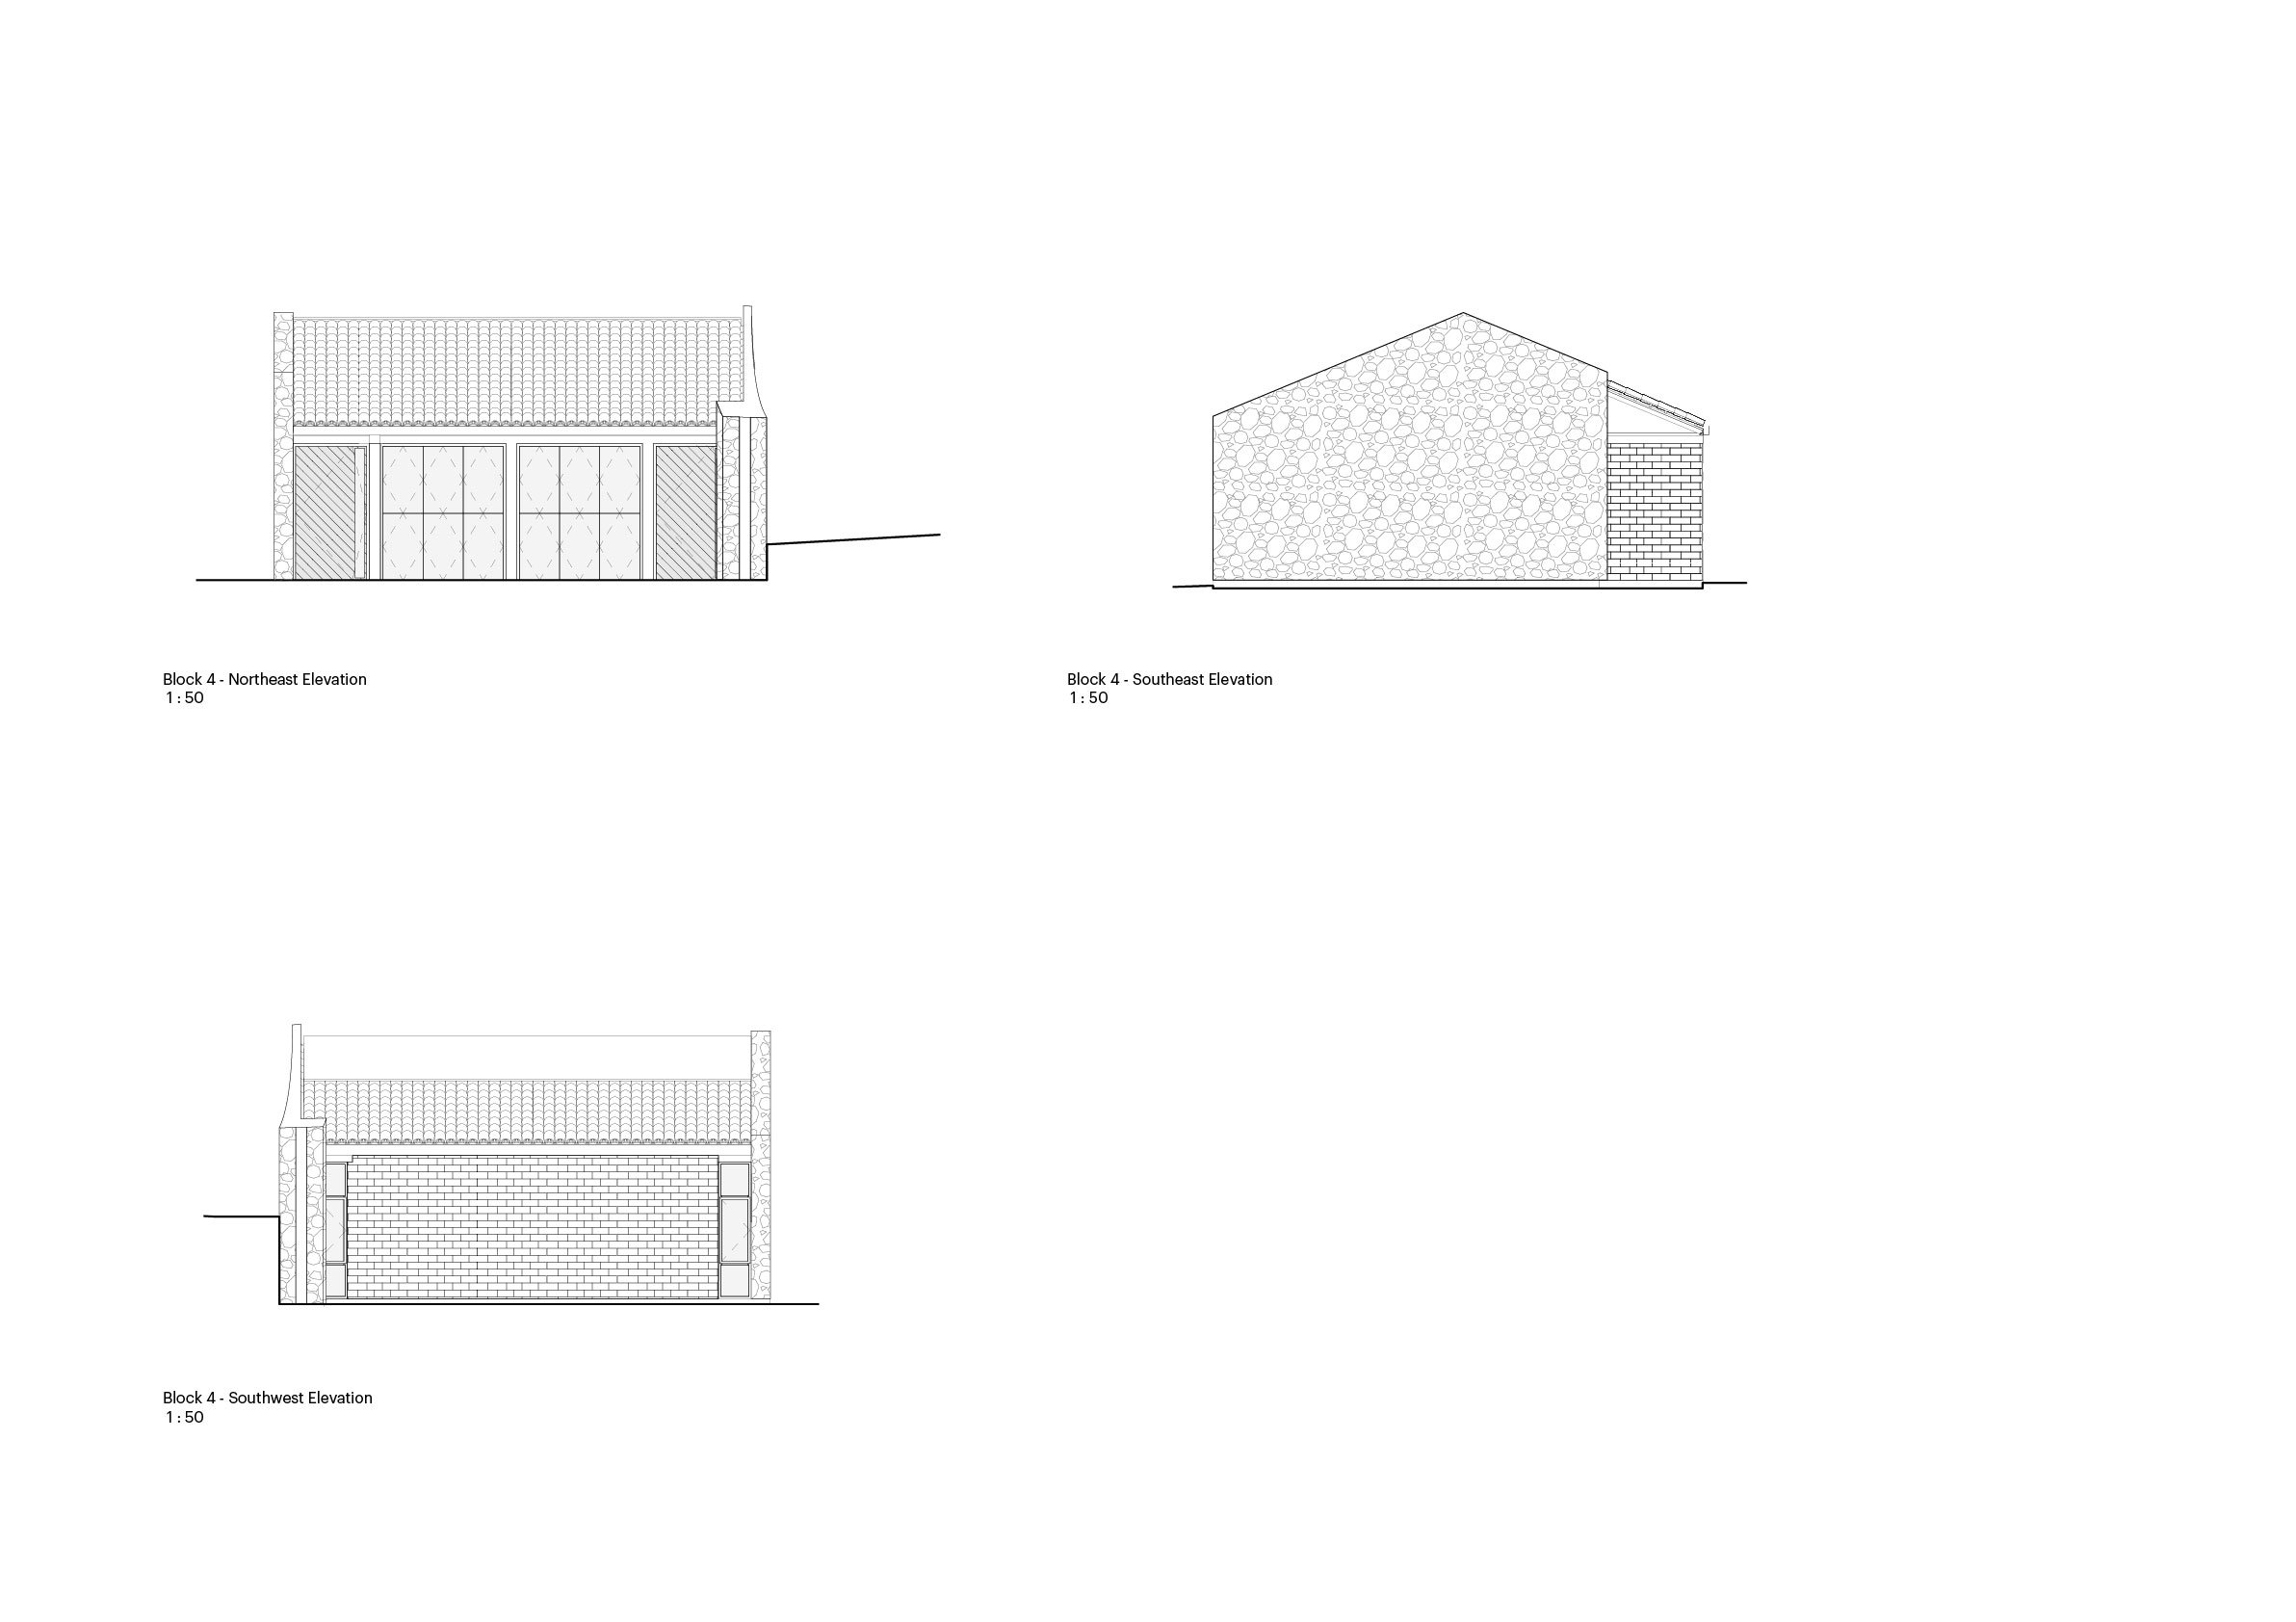 Block 4 Elevations MASS Design Group}